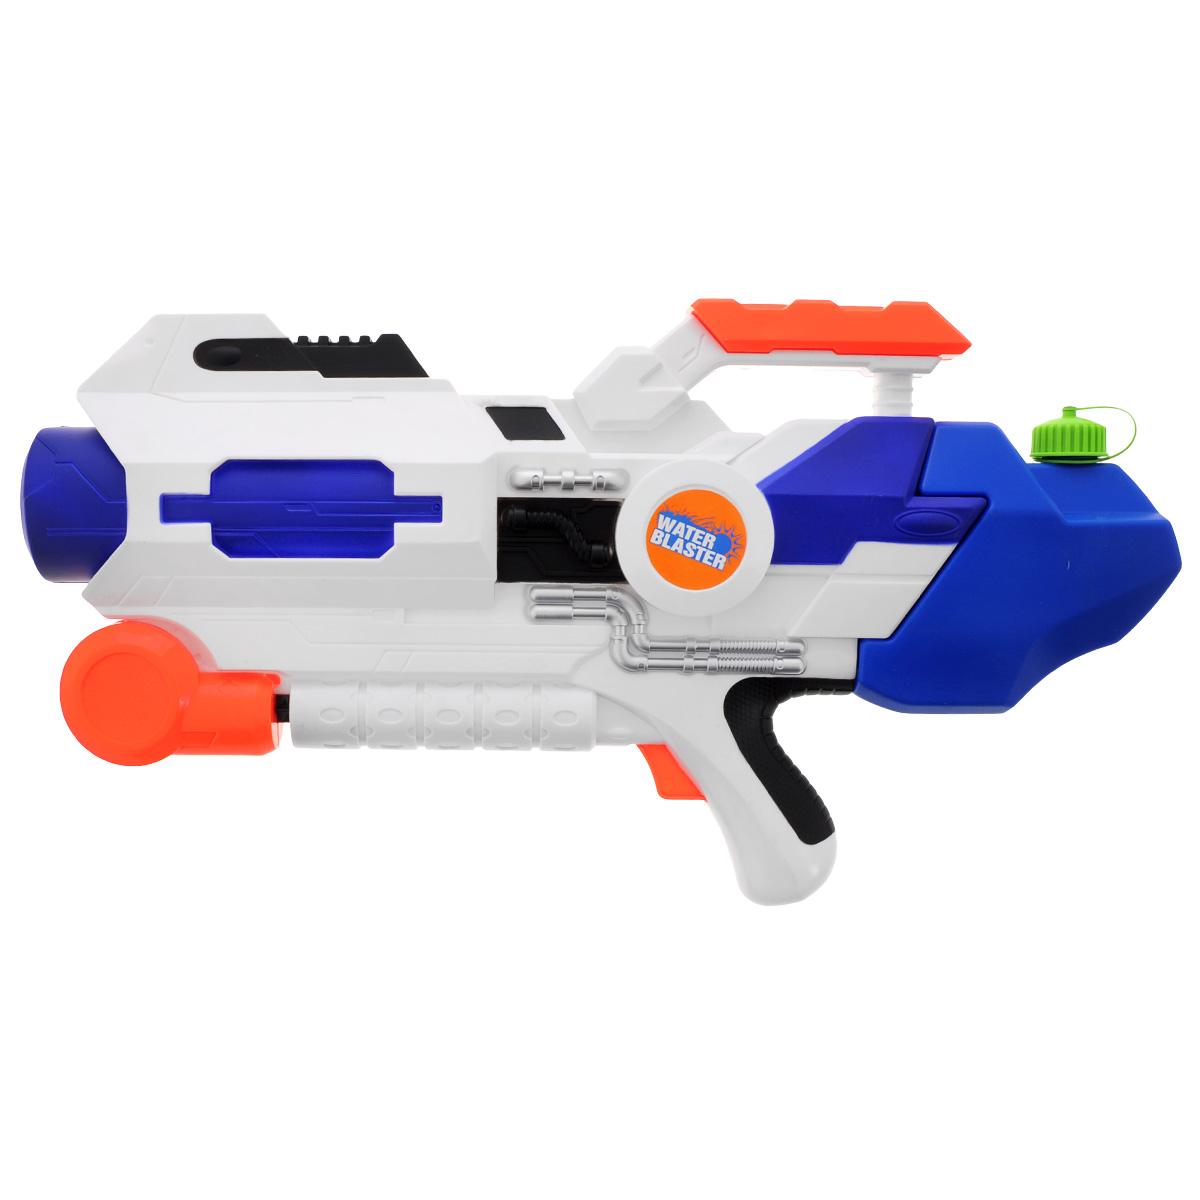 Водный бластер Bebelot Турбо: Охрана. BEB1106-036 игрушка бластер